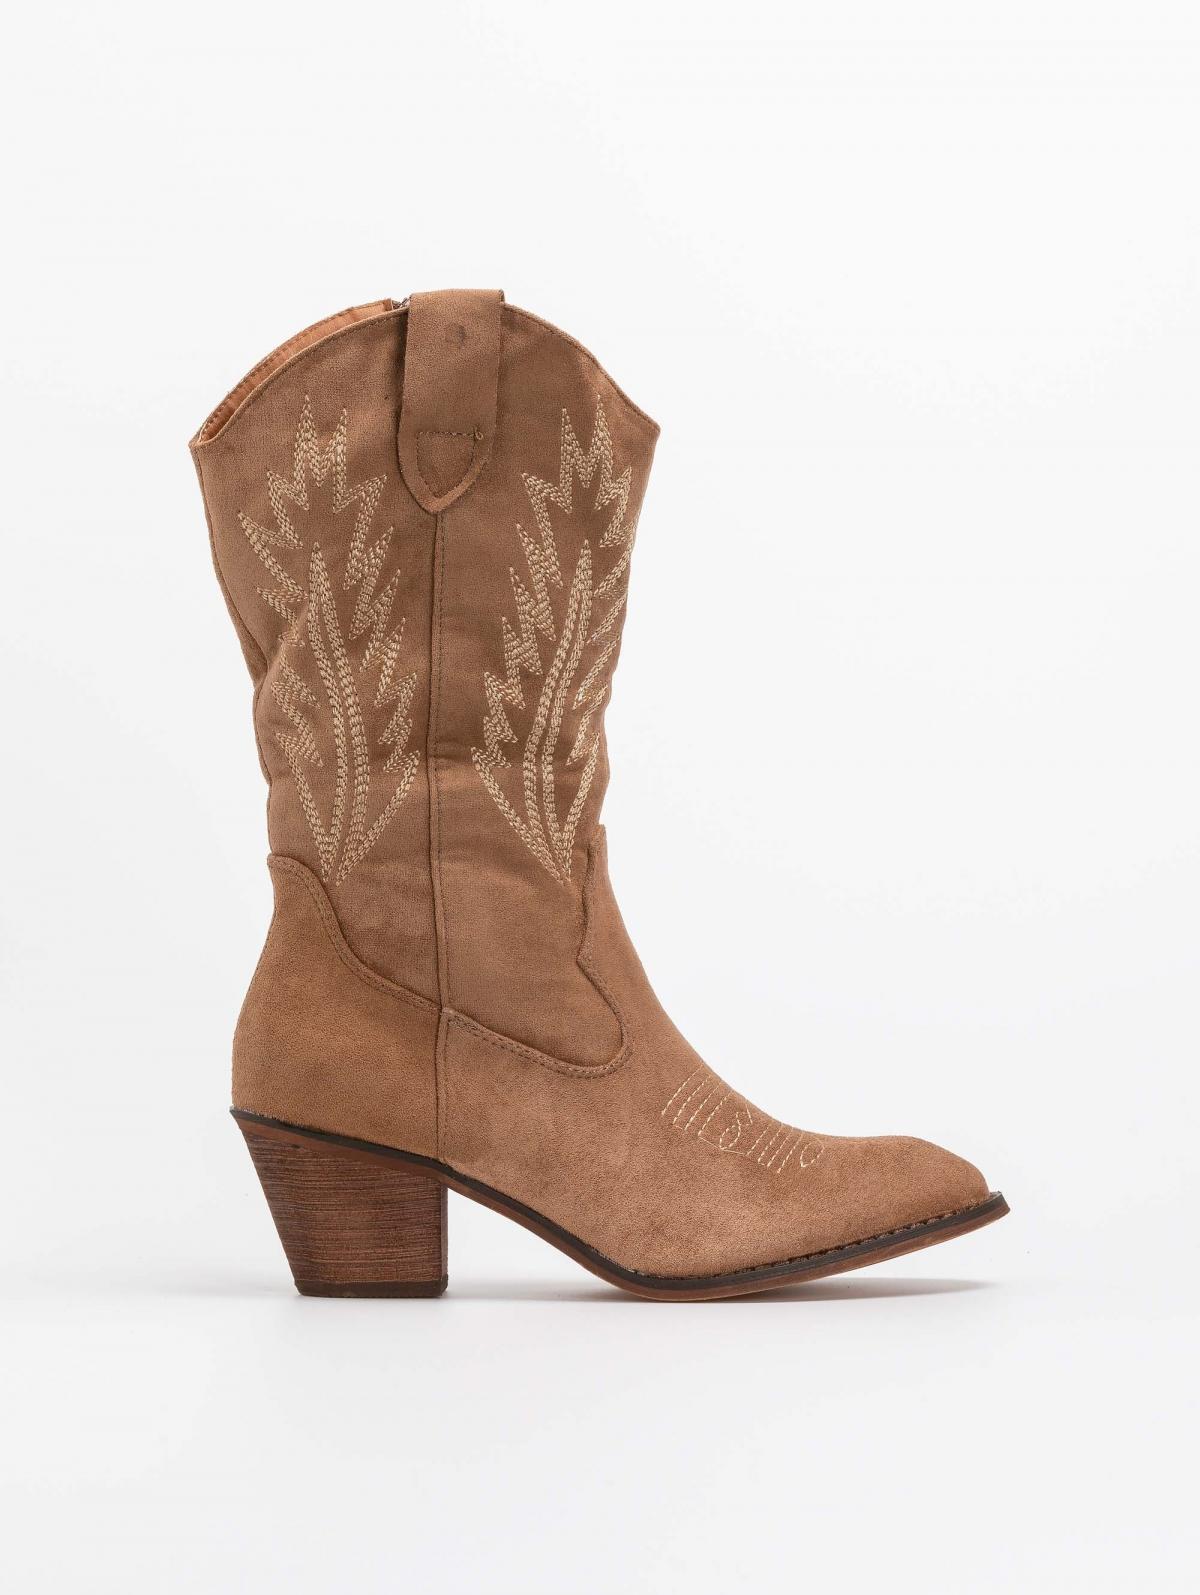 Suede western μπότες με ξύλινο τακούνι - Πούρο